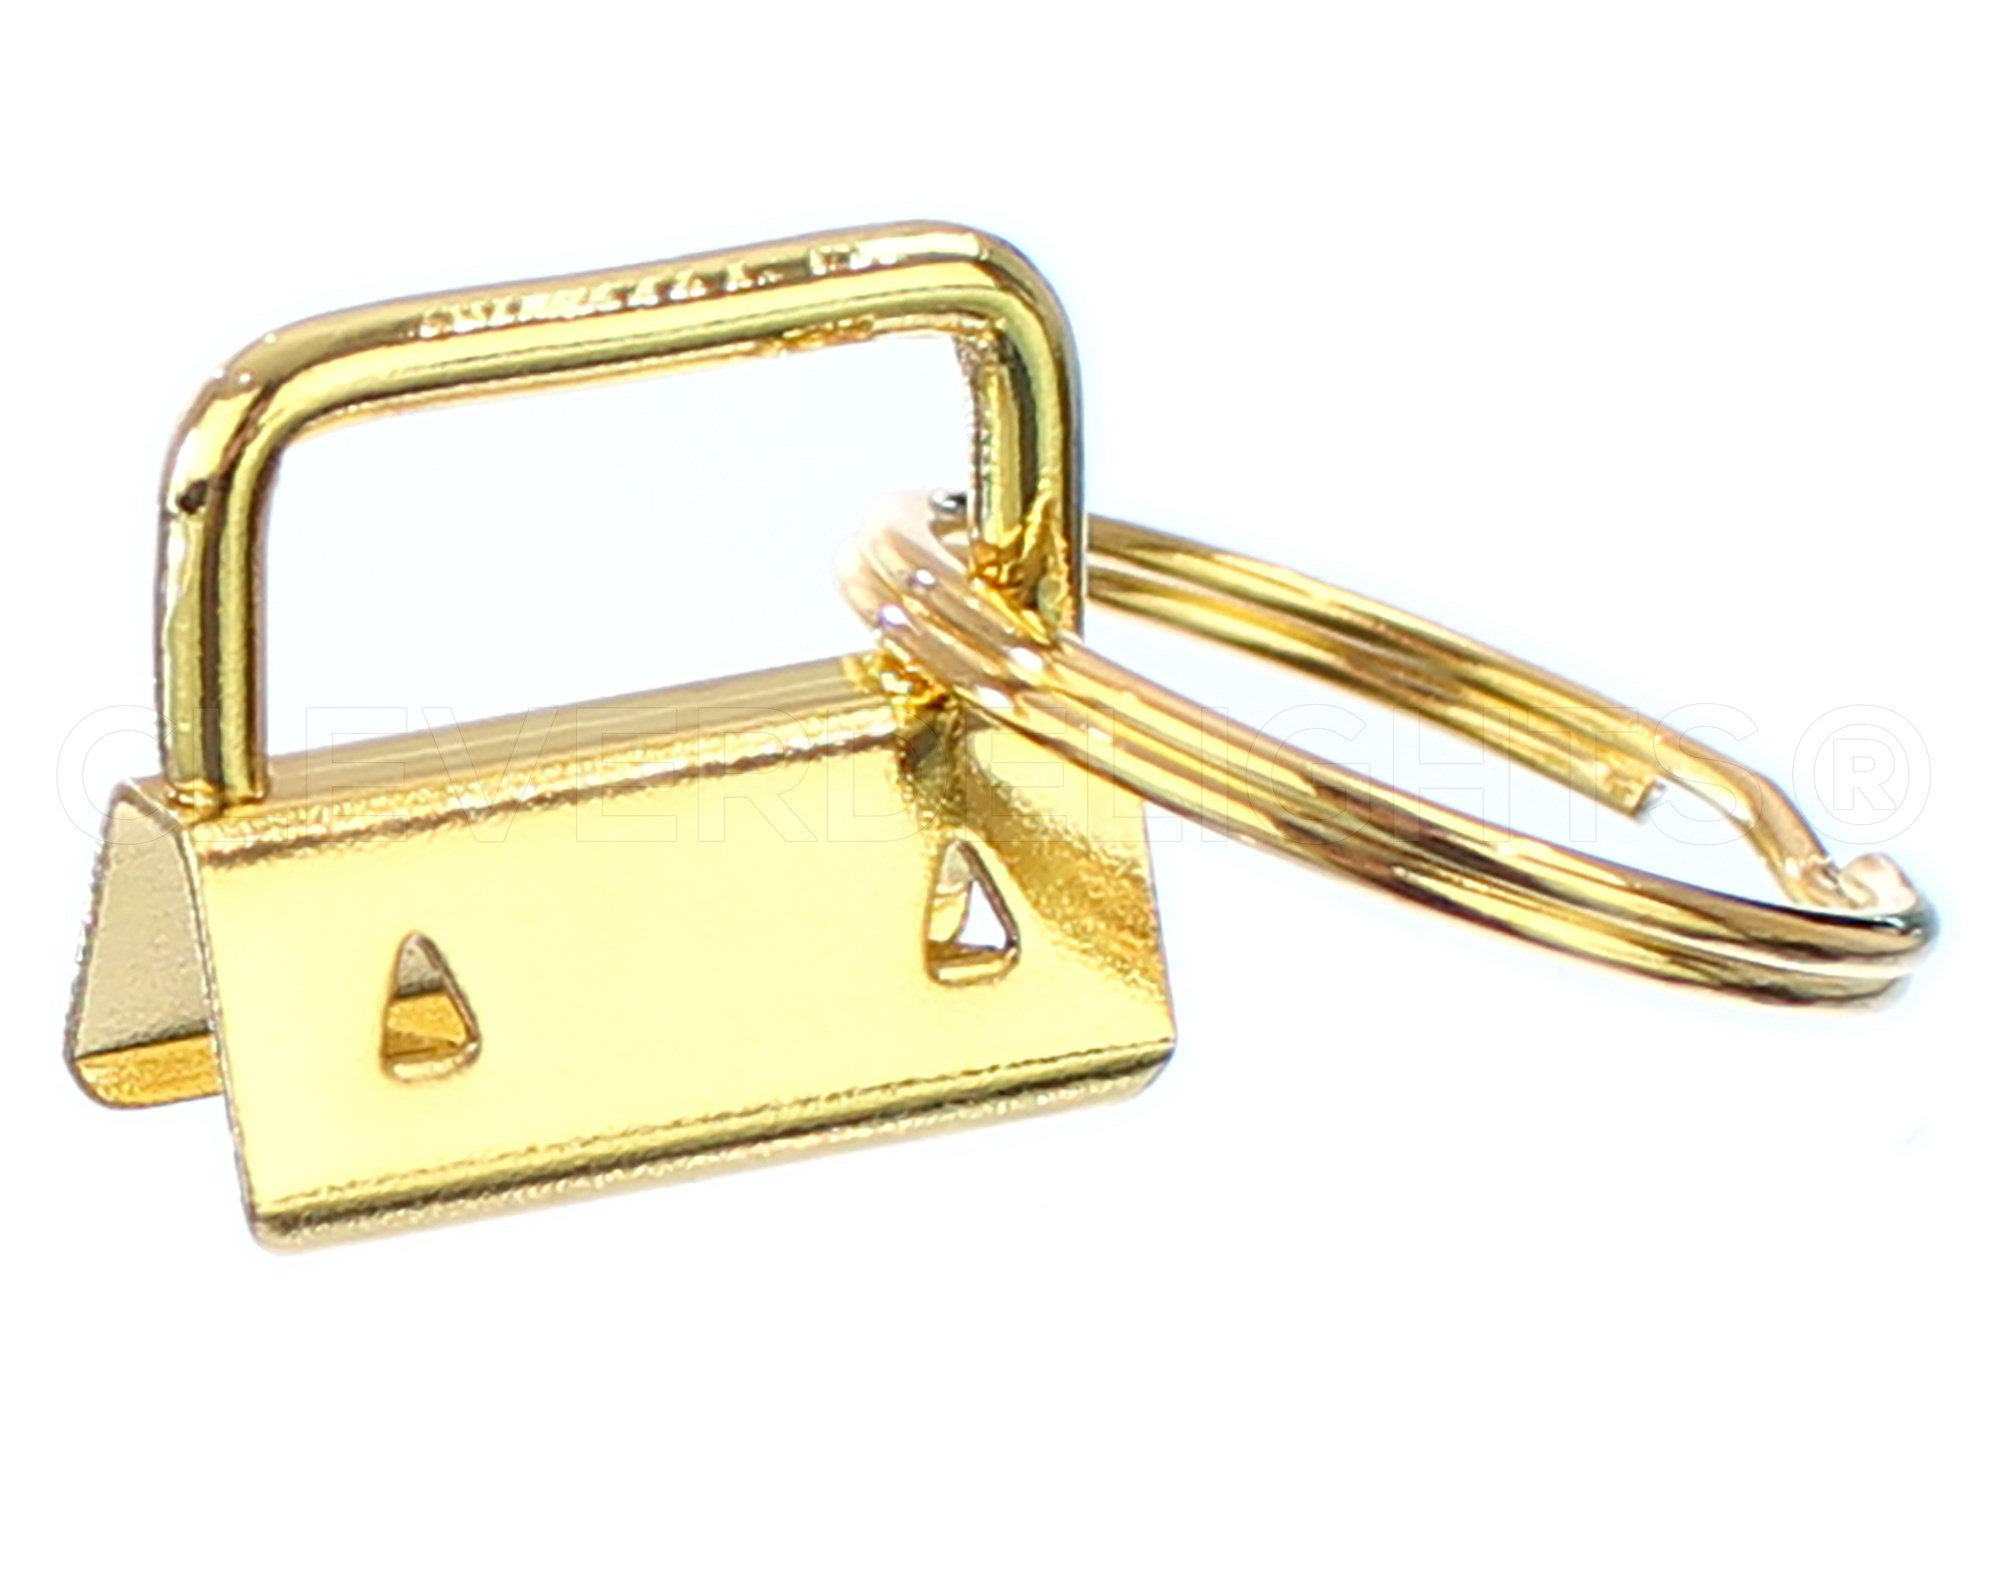 50 Sets Key Fob Hardware KeyRings for Ribbon Key Chains Wristlet Craft Supplies